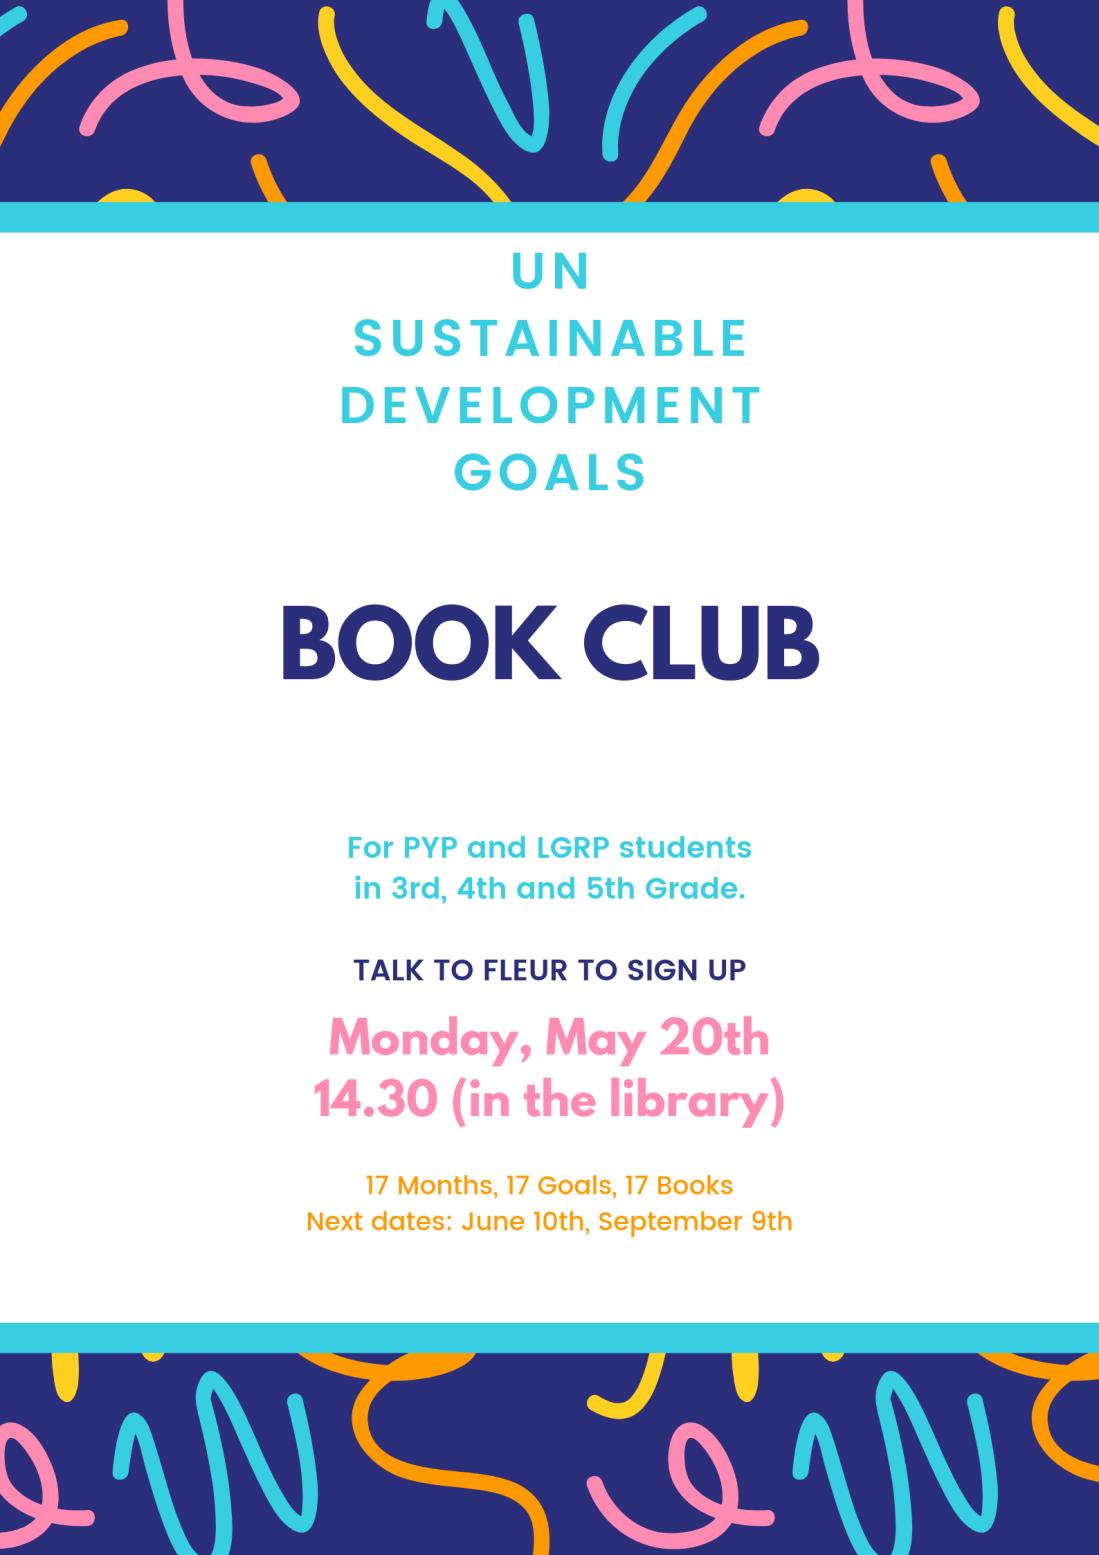 Sustainable development Goals isgr Book club